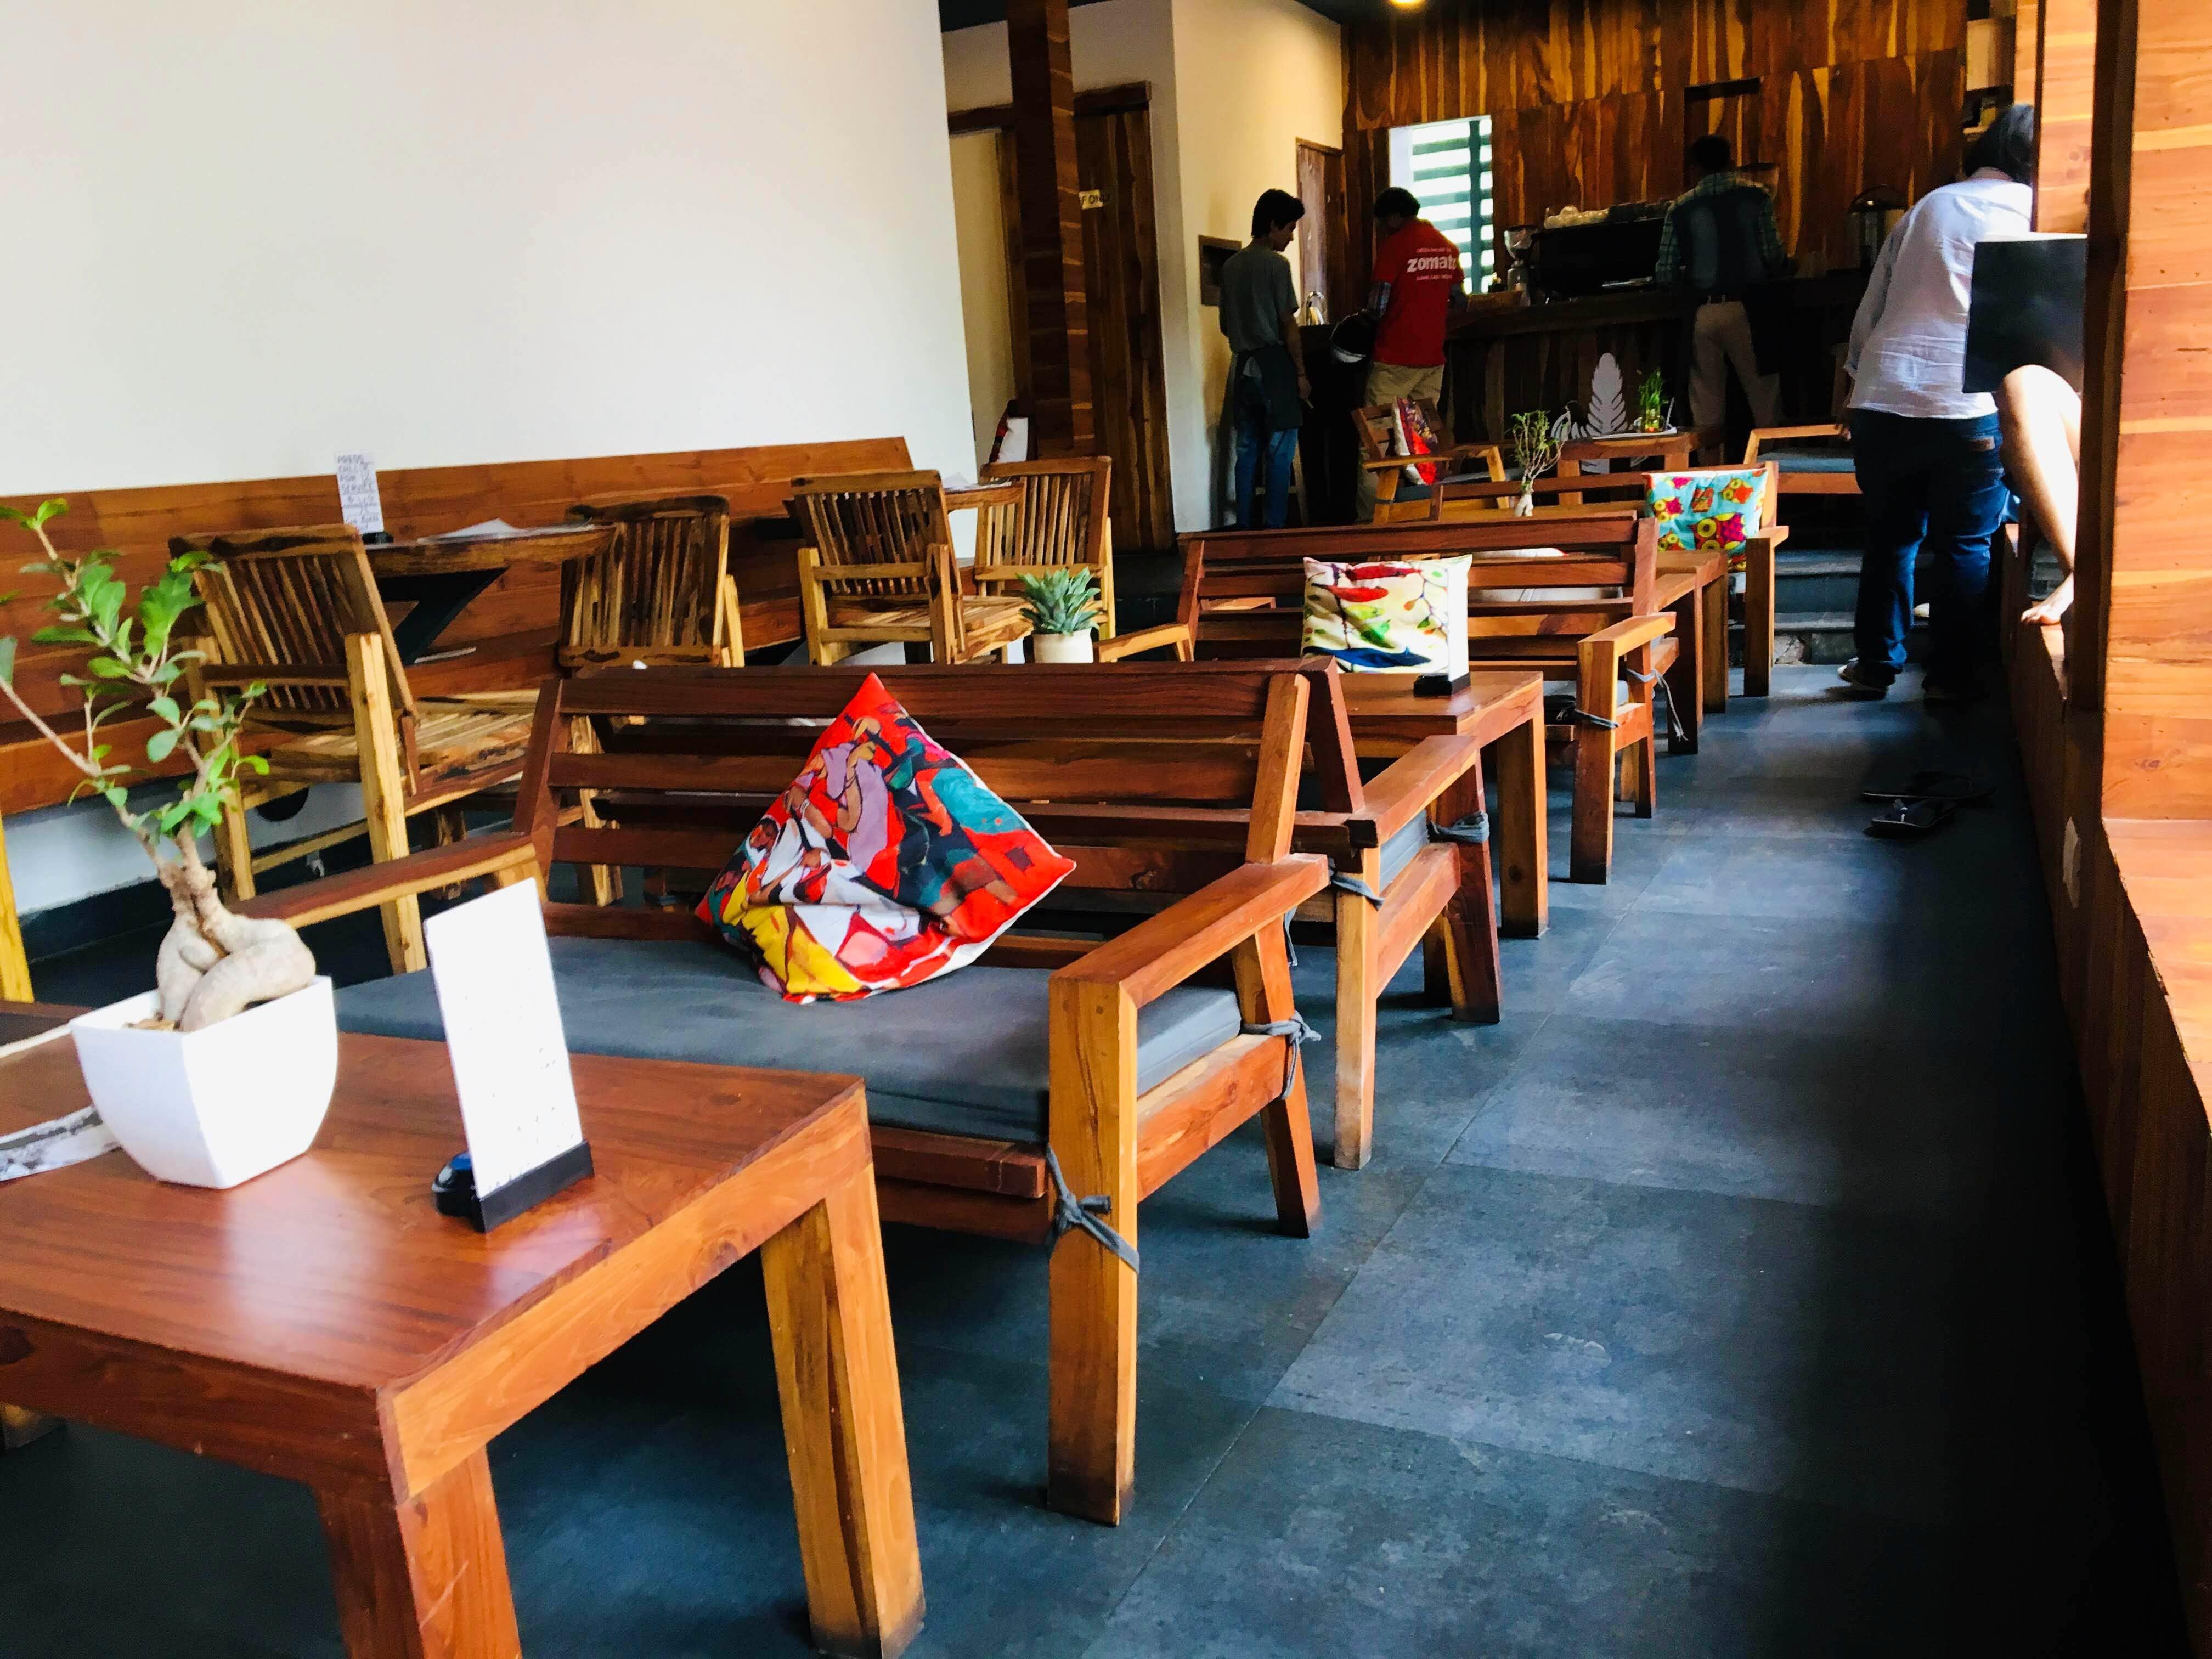 Best cafes in south delhi | Buzz Delhi